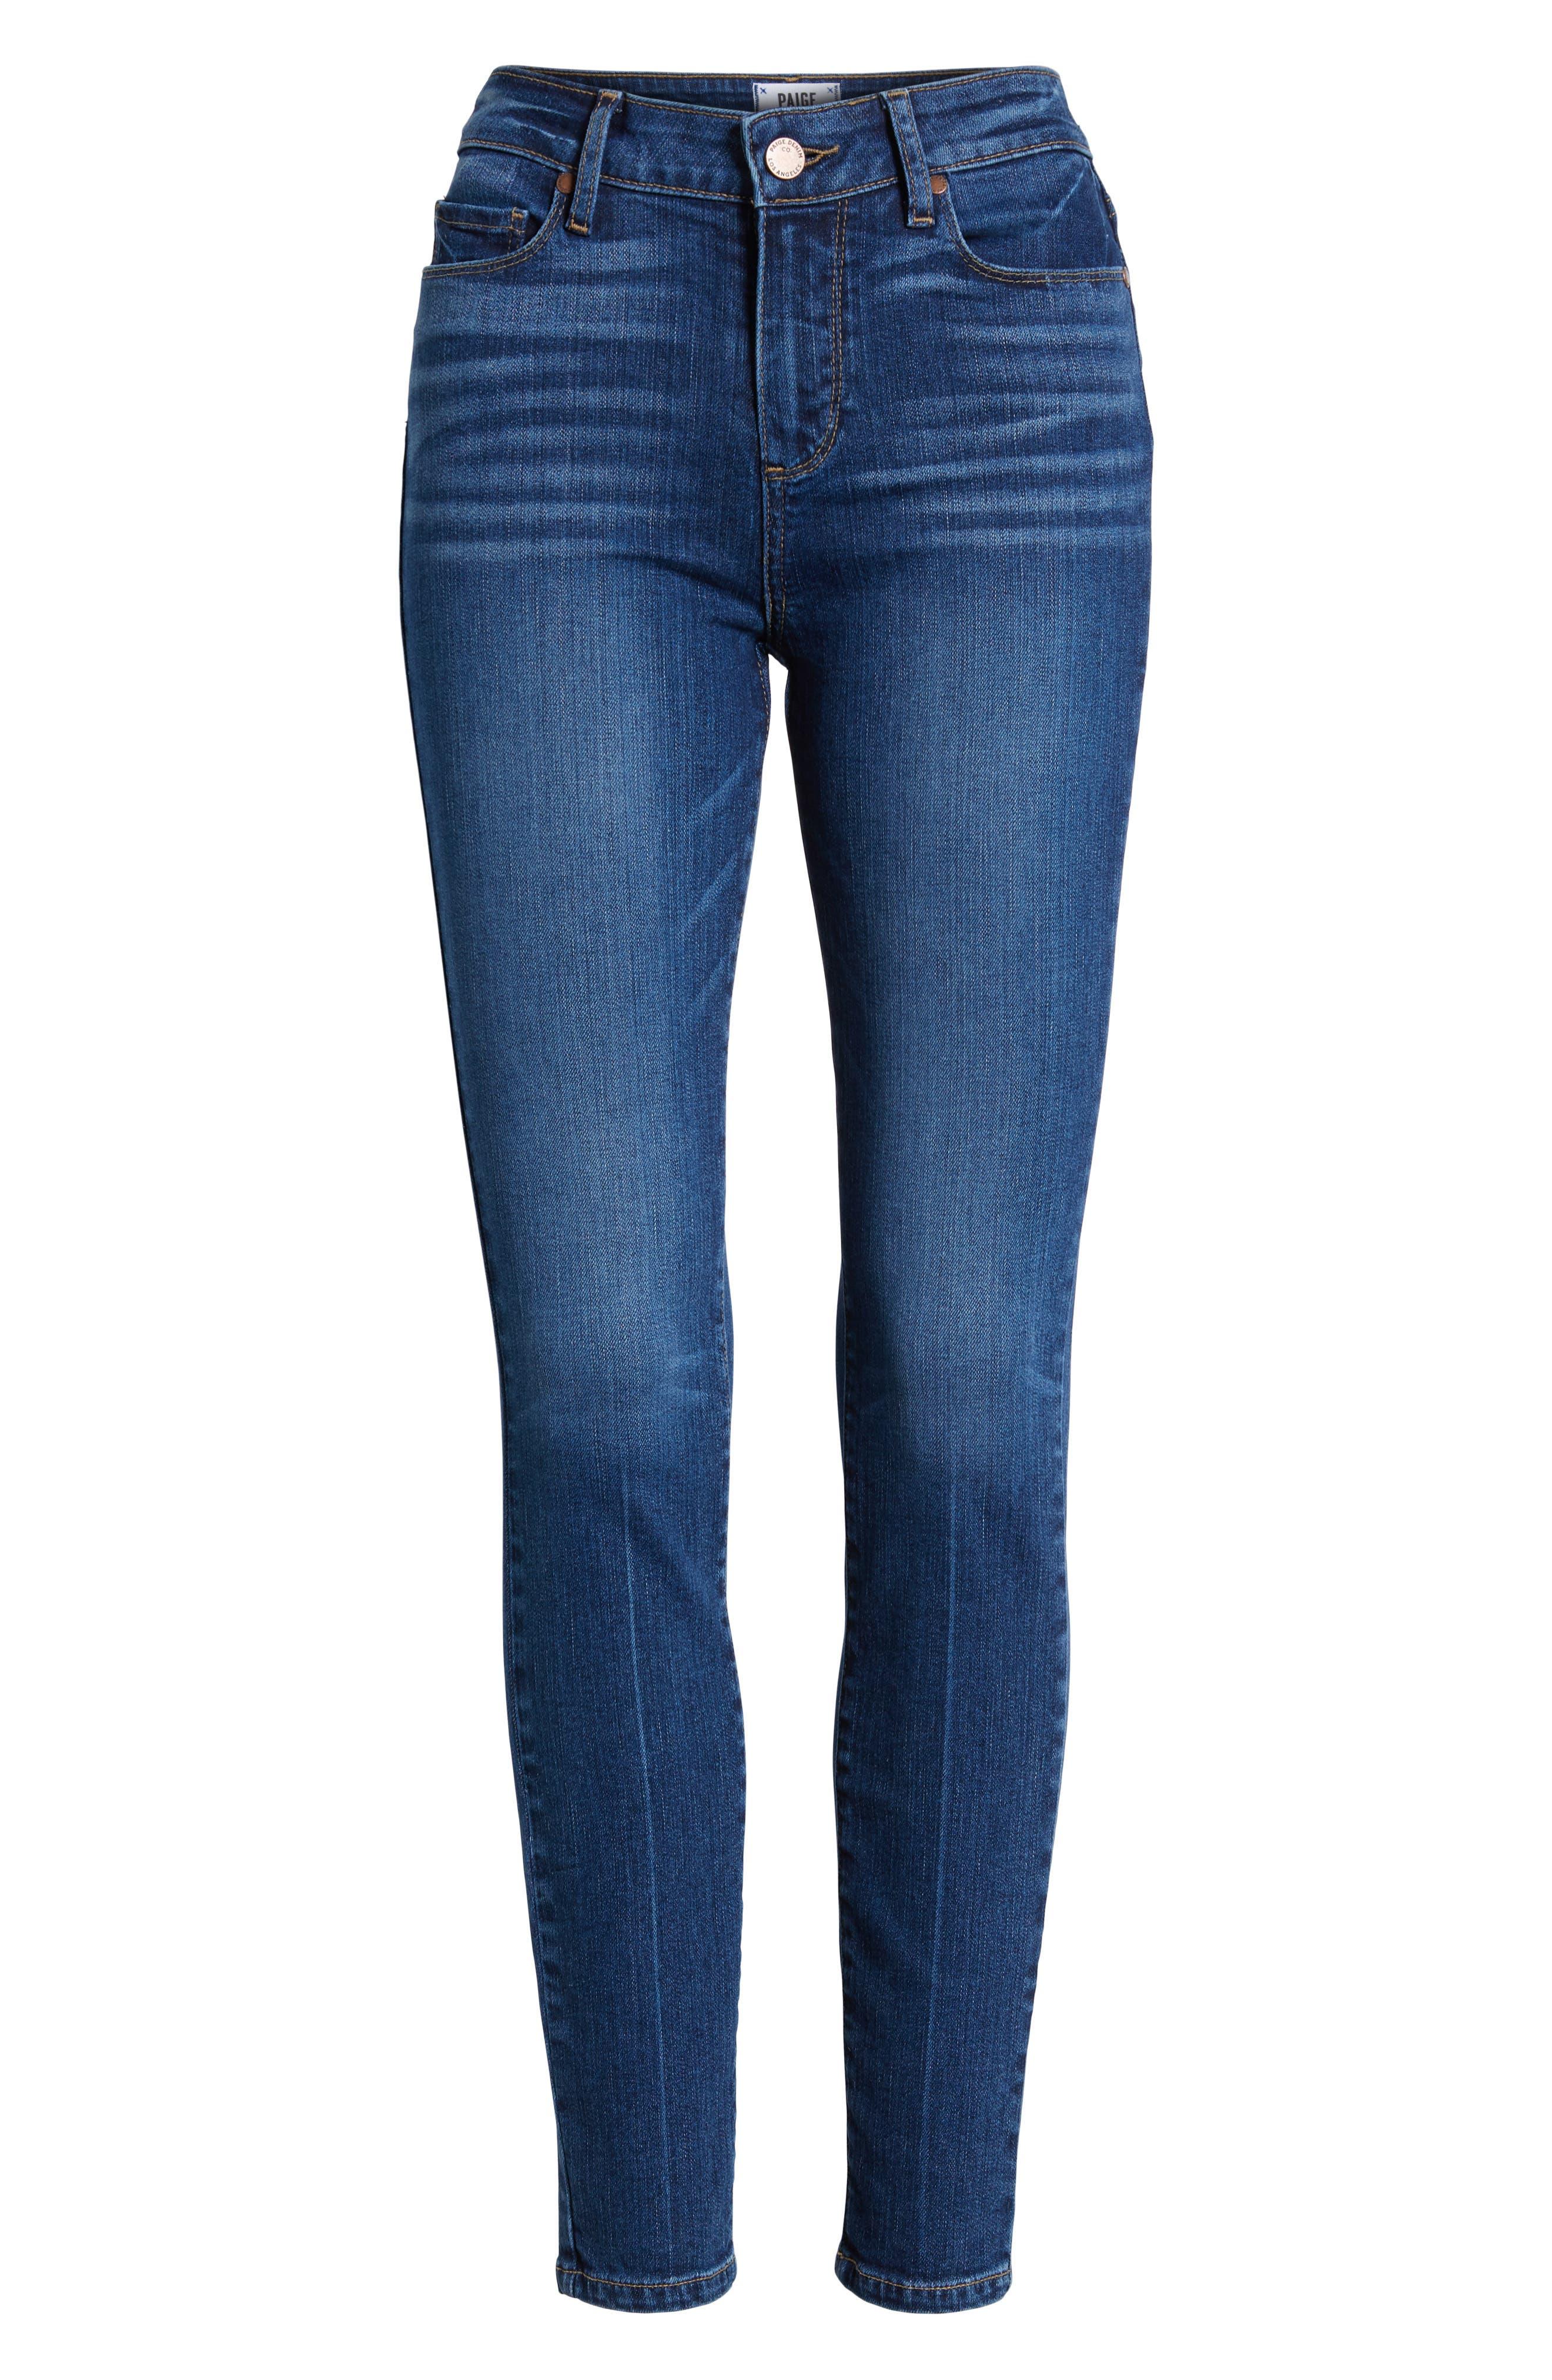 Verdugo Ankle Skinny Jeans,                             Alternate thumbnail 7, color,                             Salida